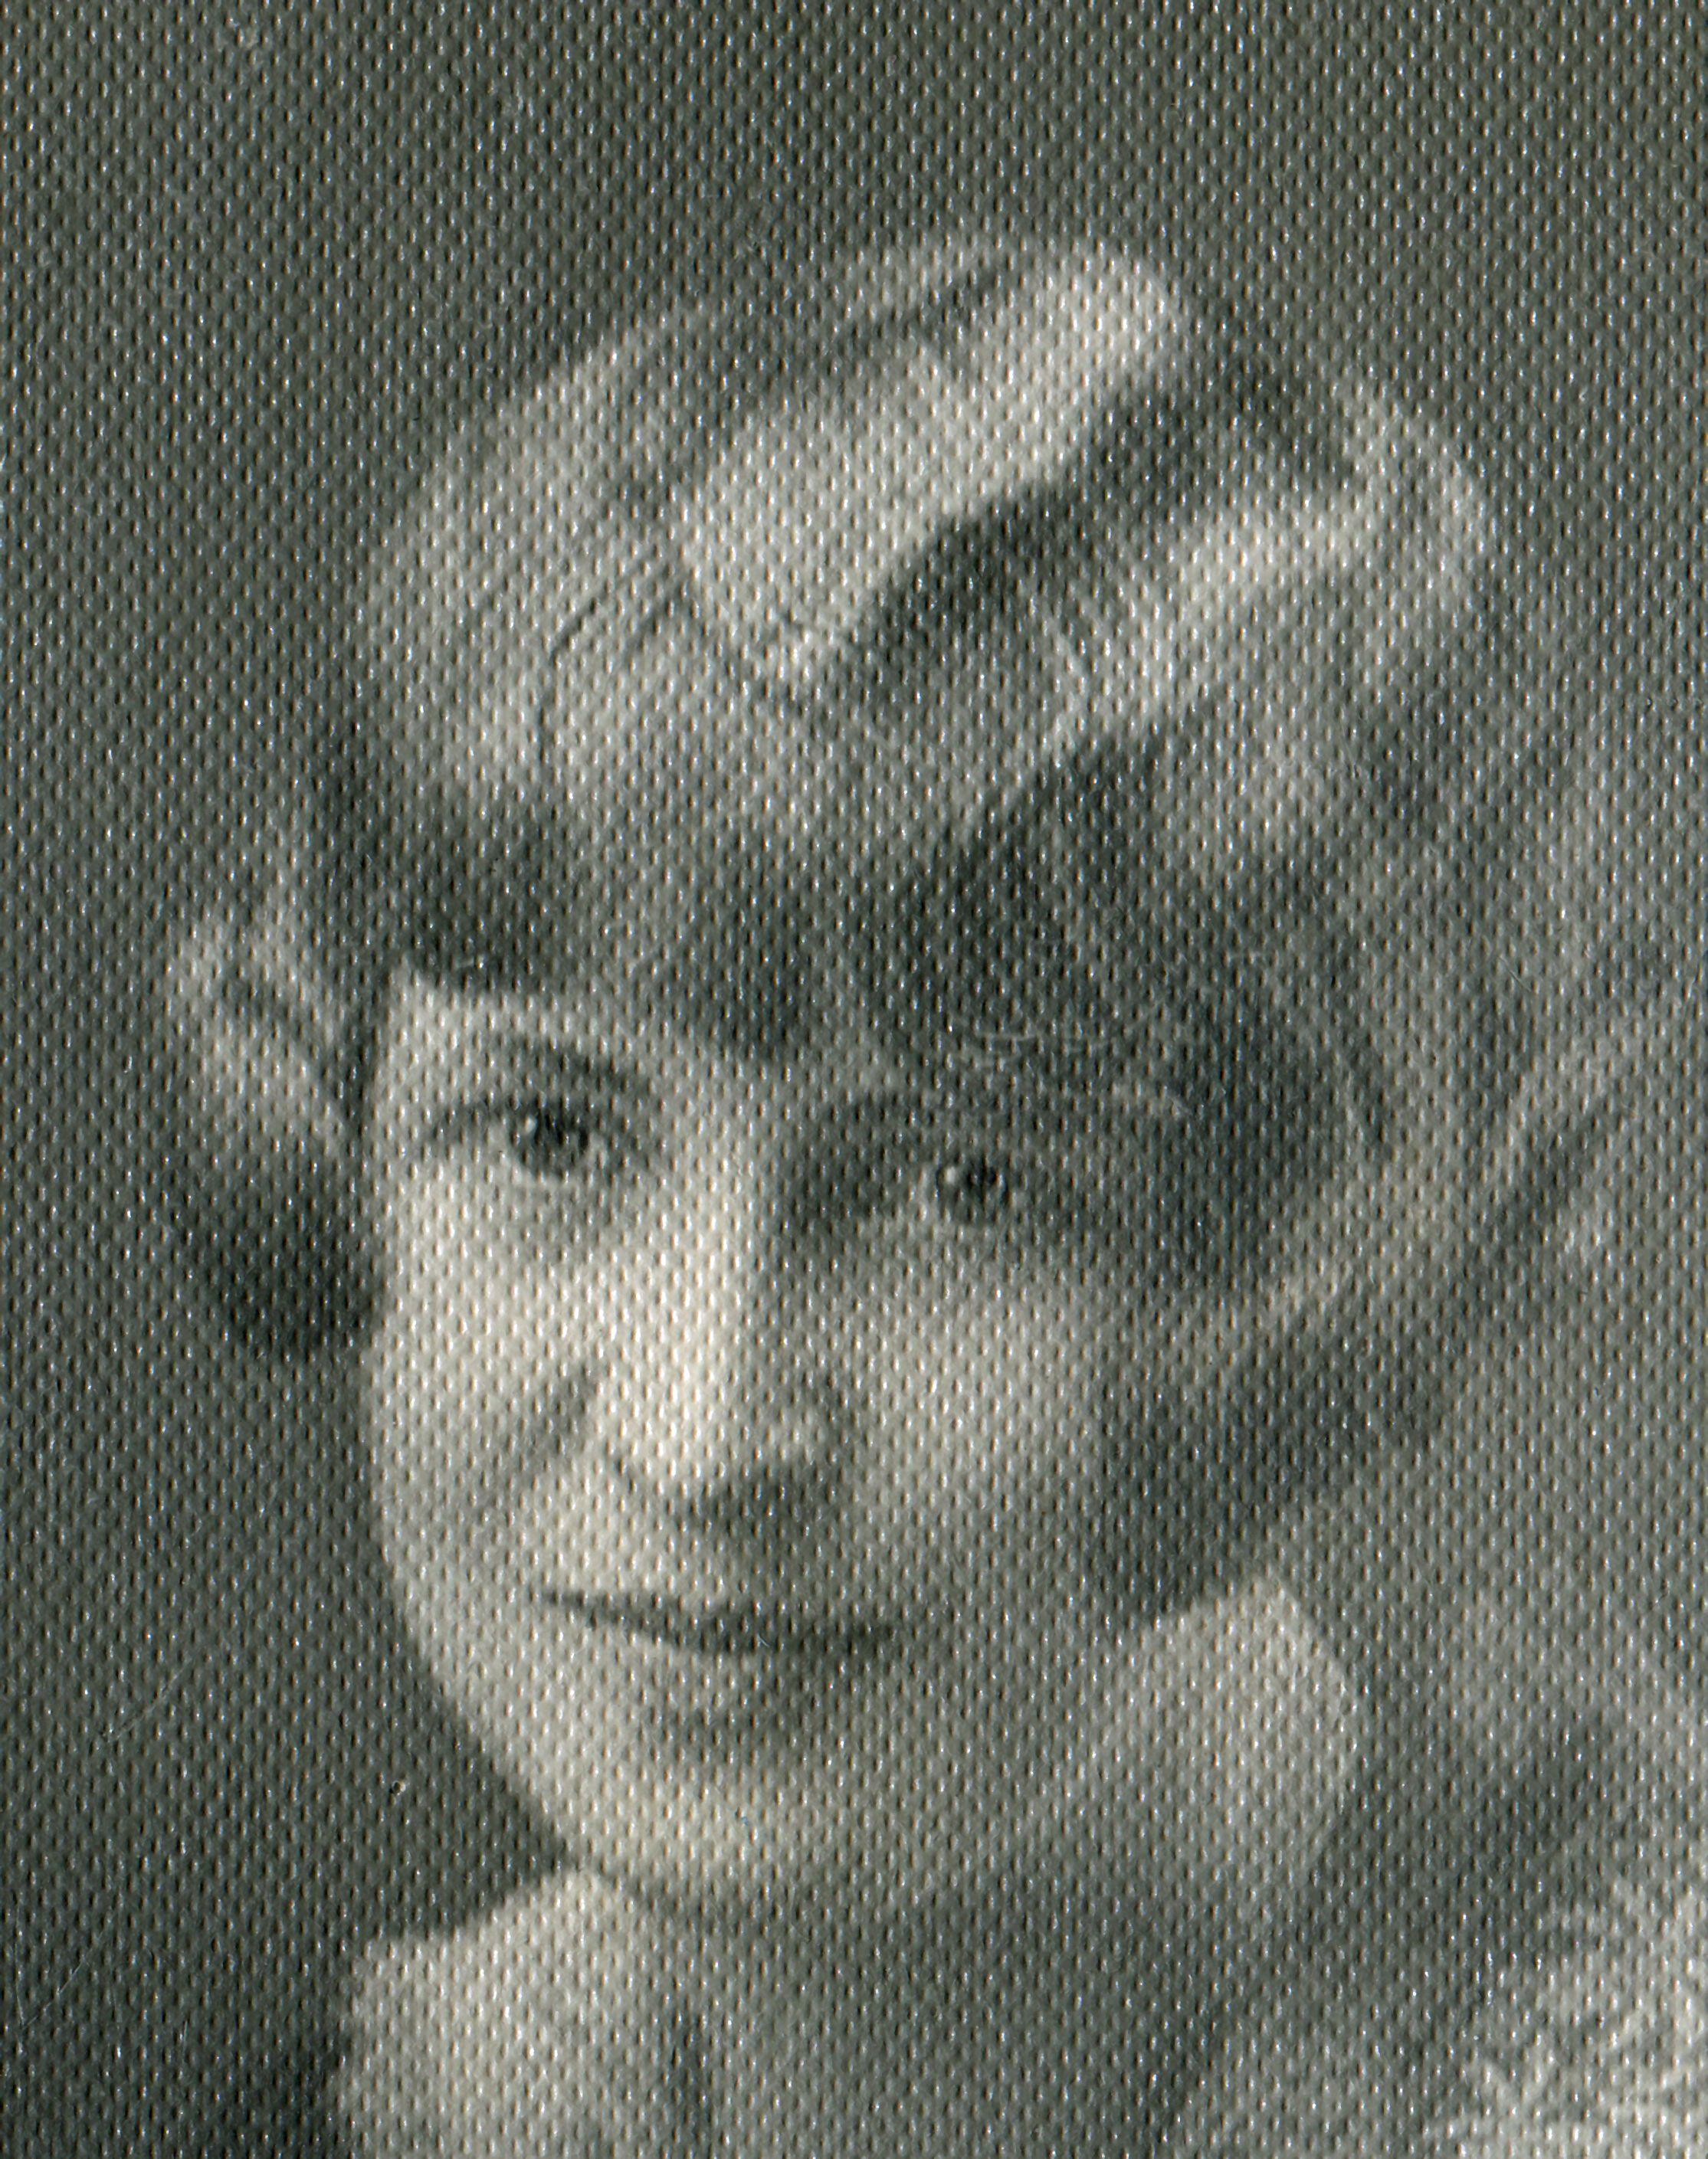 Lind, Edith Melvina